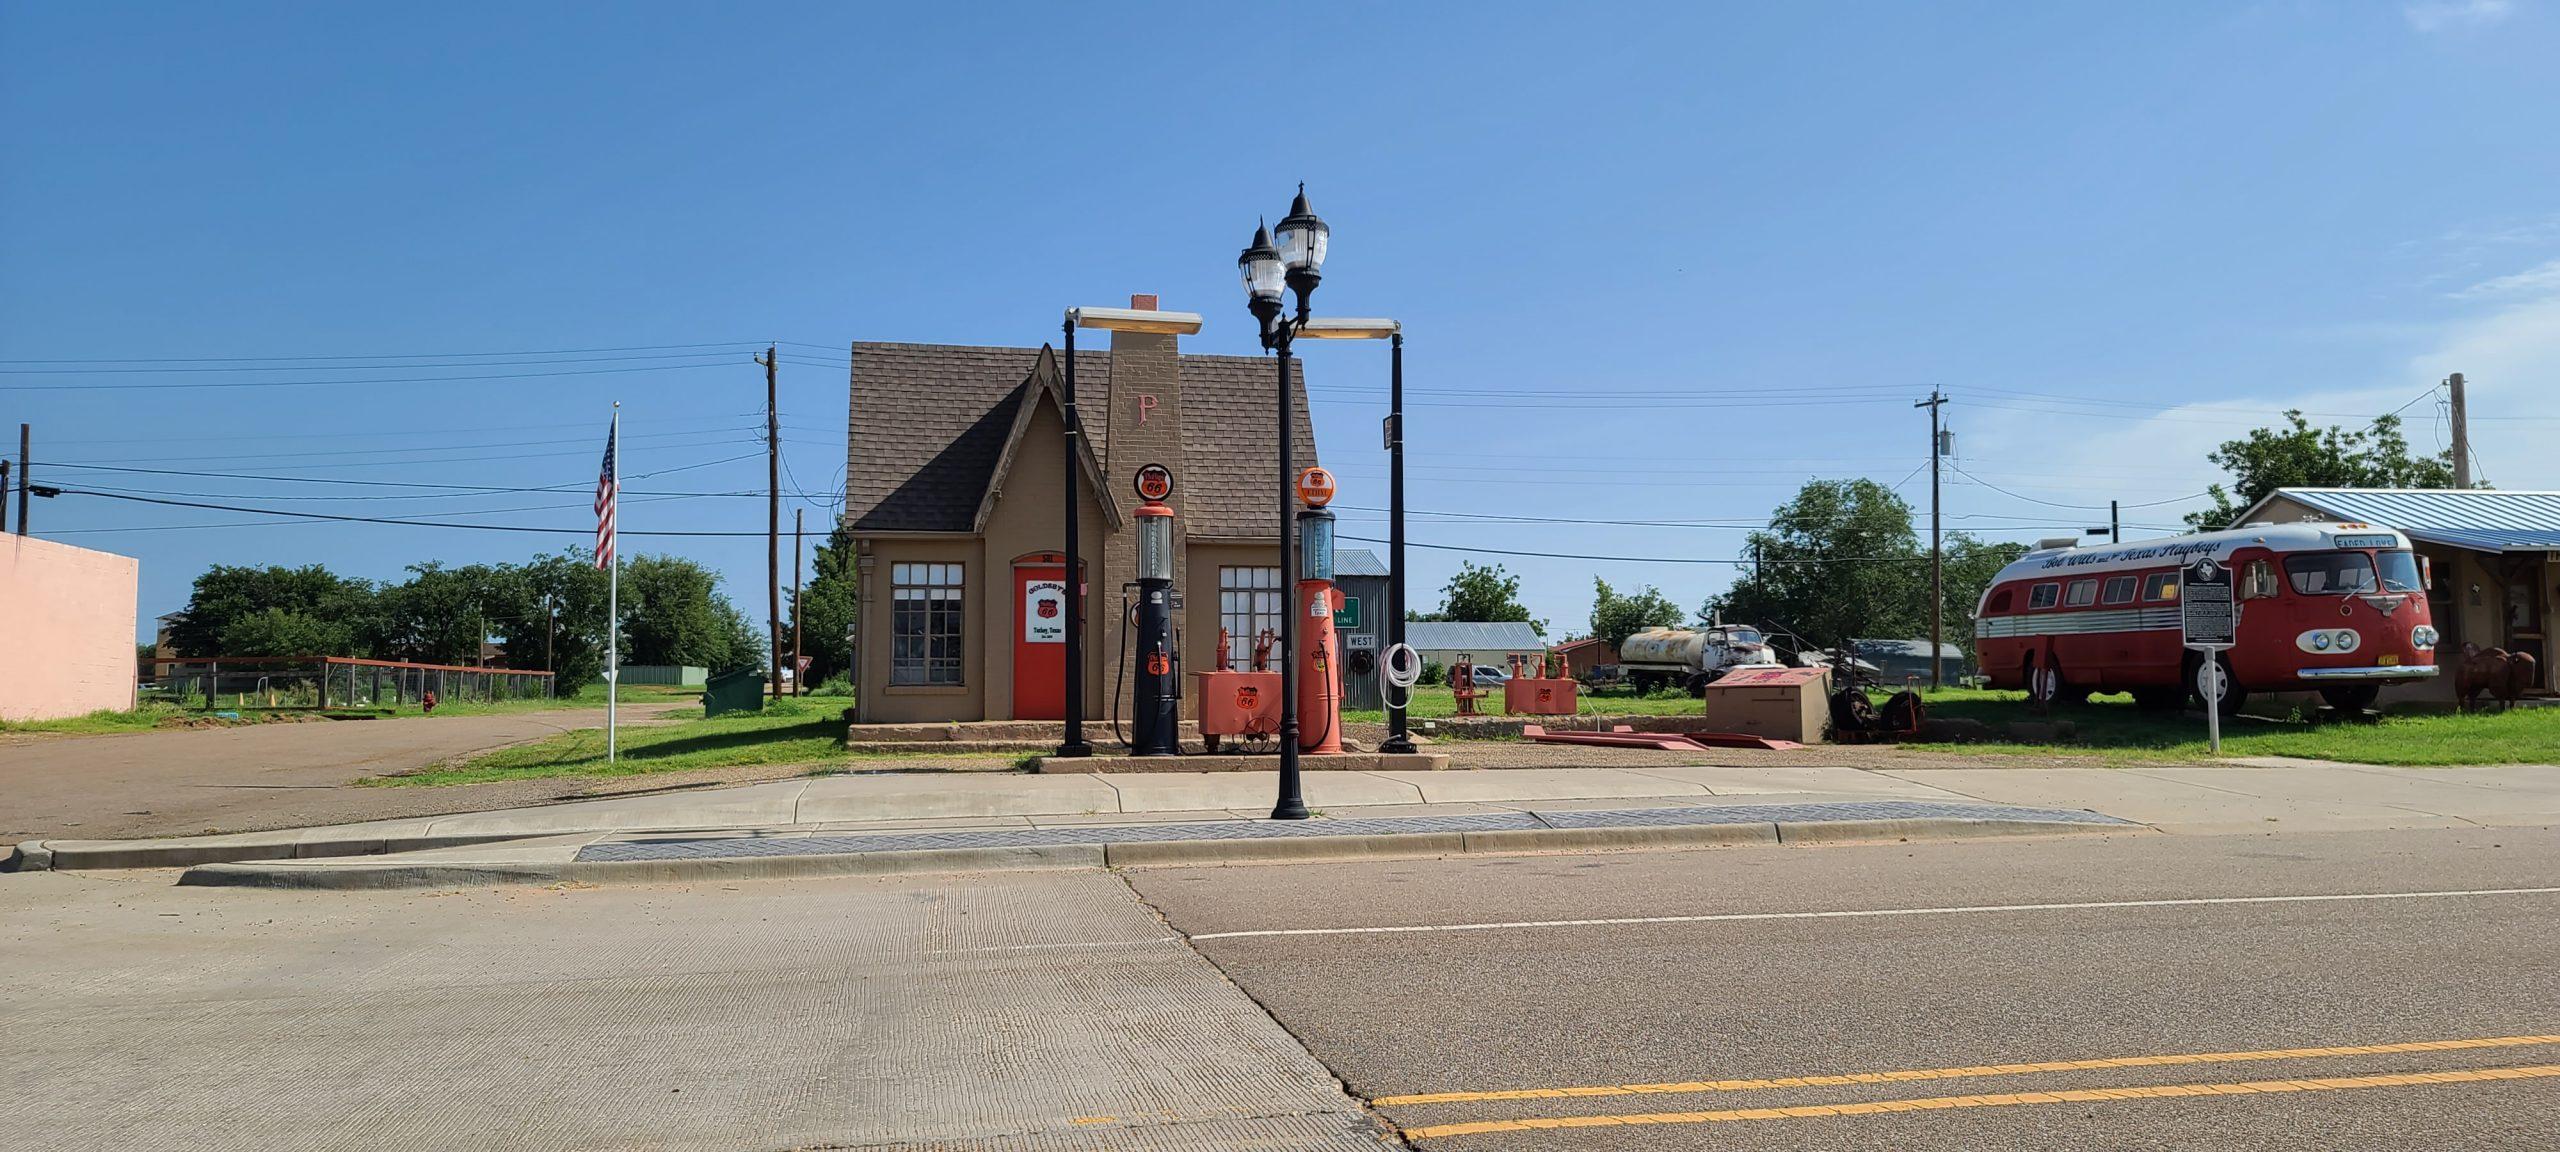 Phillips 66 Gas Station in Turkey, Texas